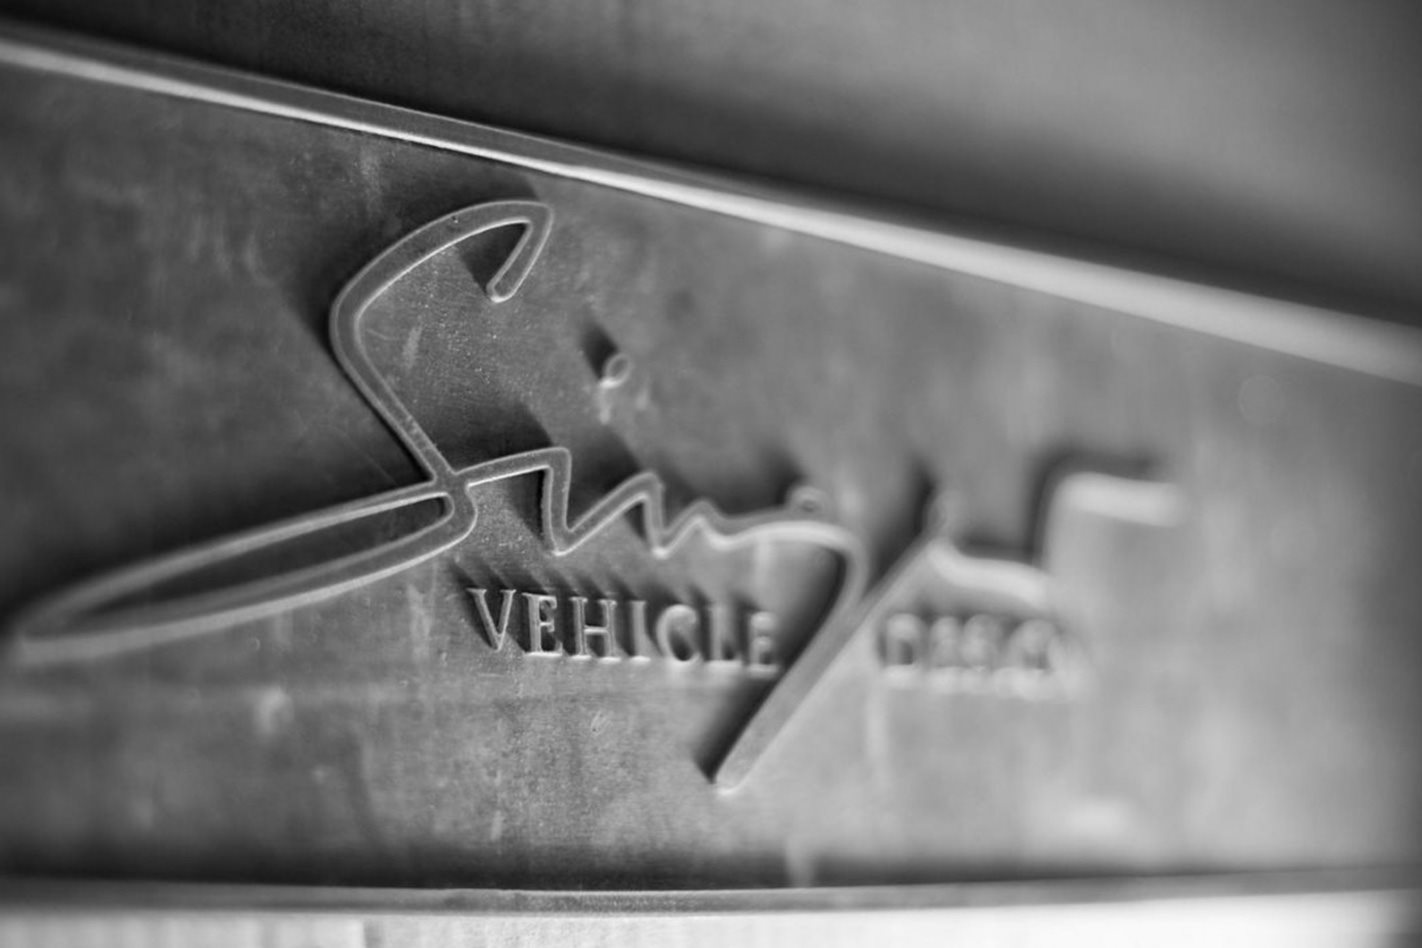 Singer engine plate